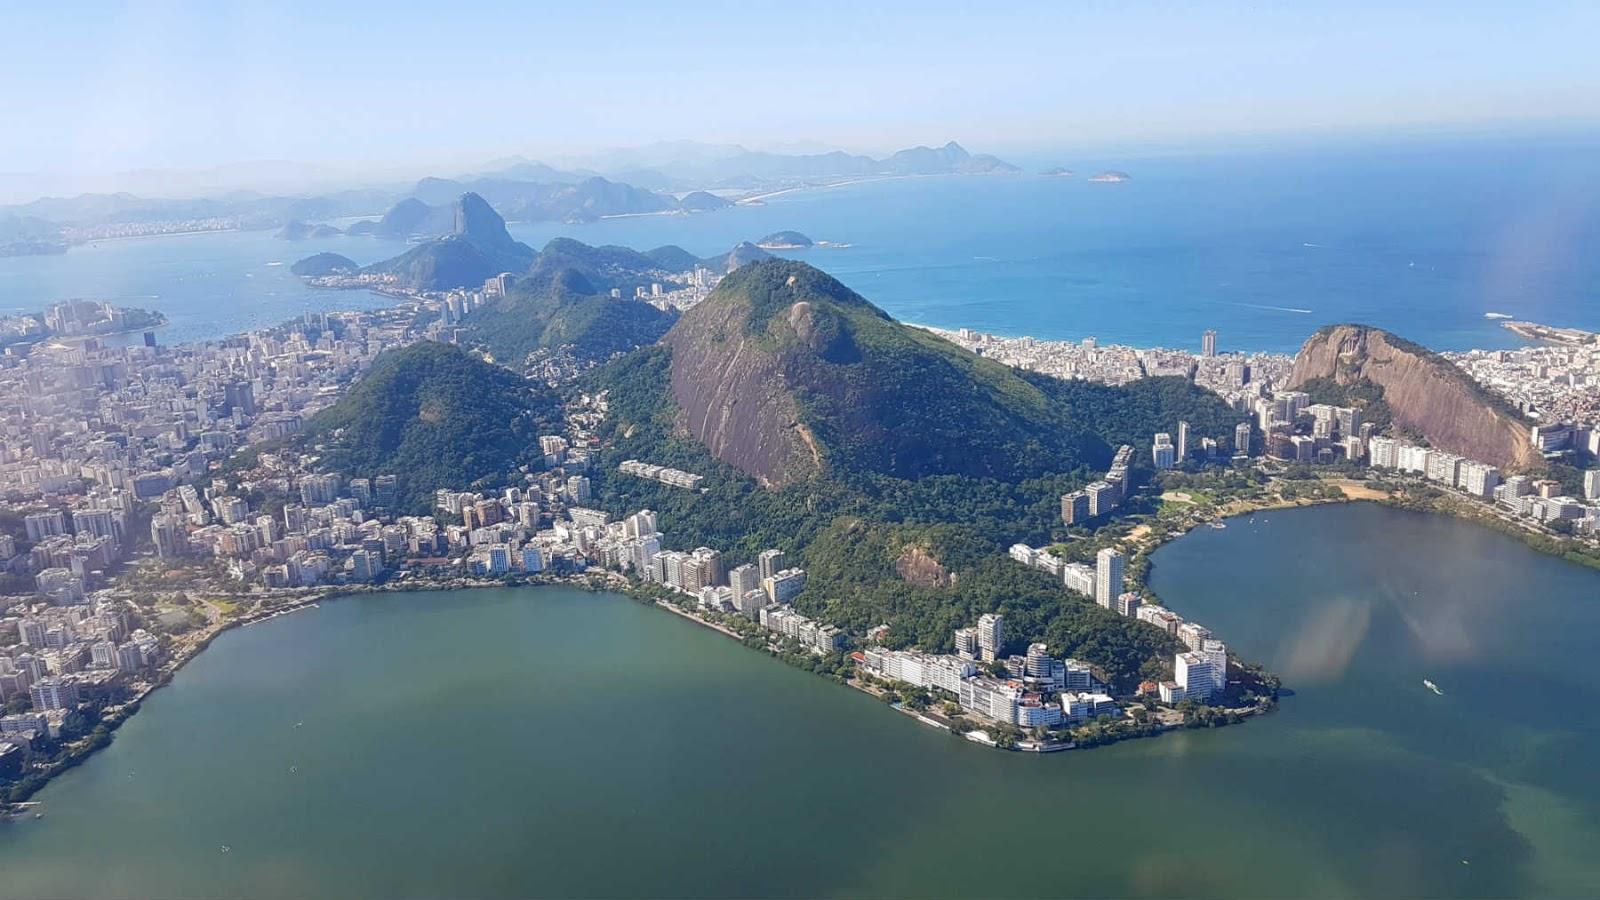 Lagoa Rodrigo de Freitas vista do voo de helicóptero no Rio de Janeiro.